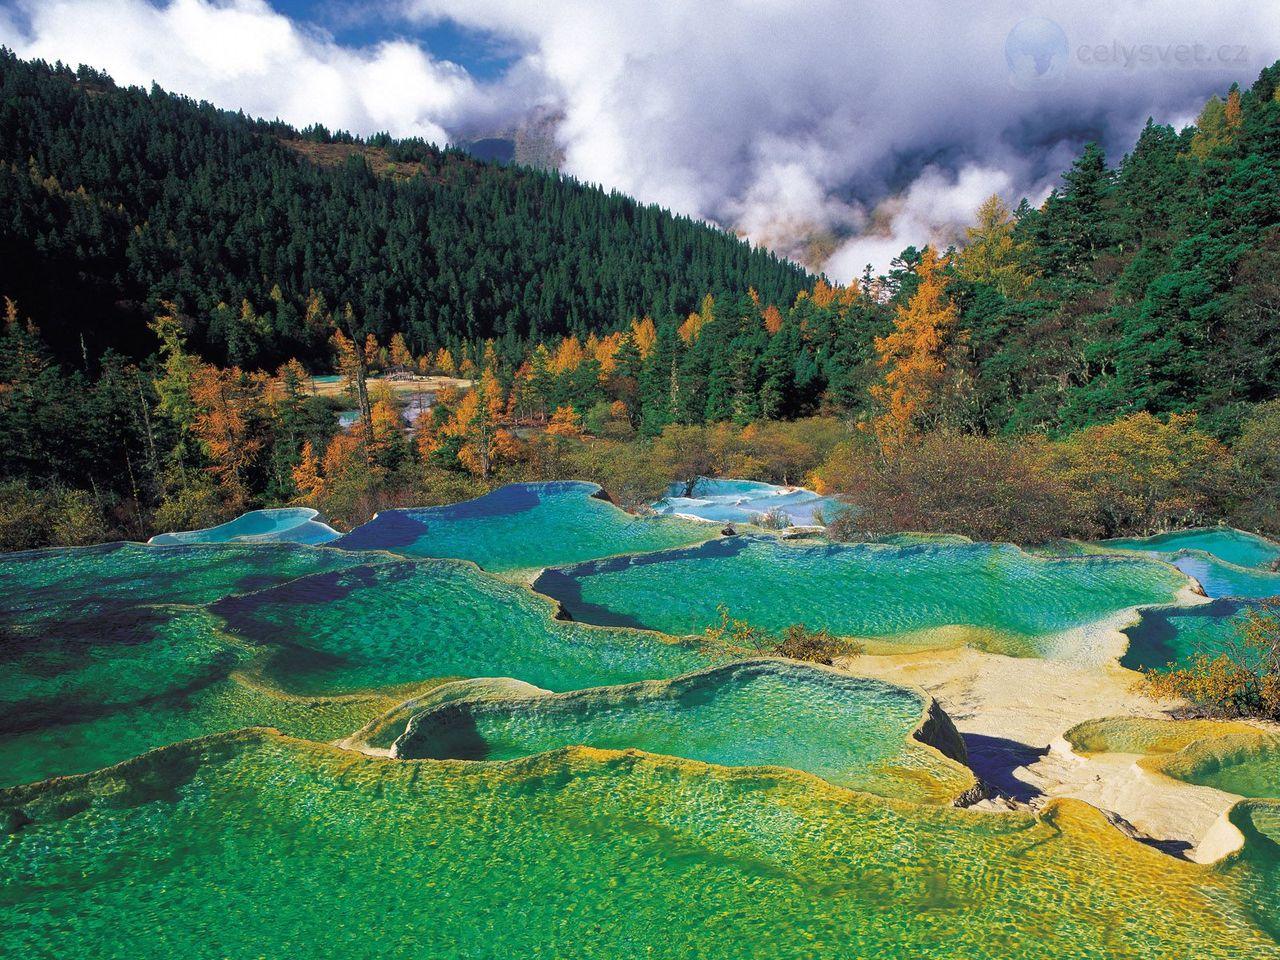 Huanglong přírodní rezervací, sichuan, čína / huanglong natural